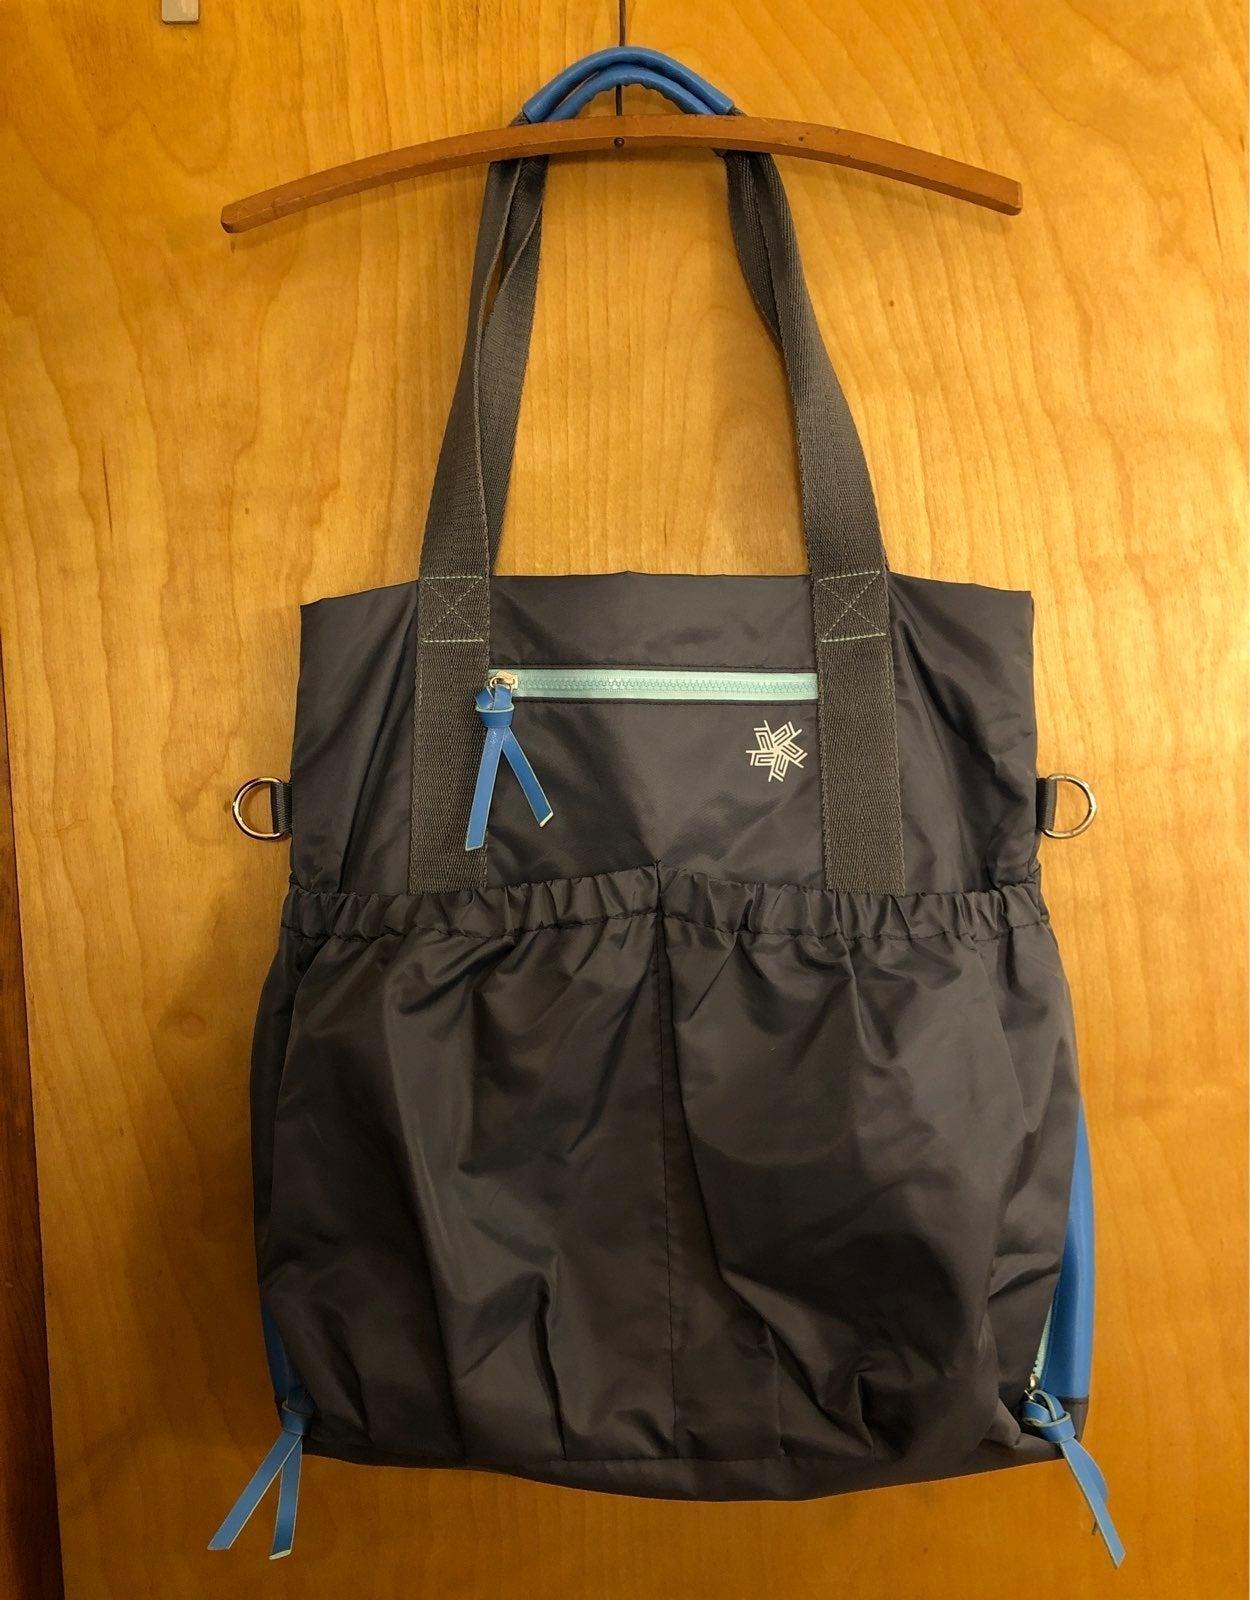 Tek Gear Gym Bag